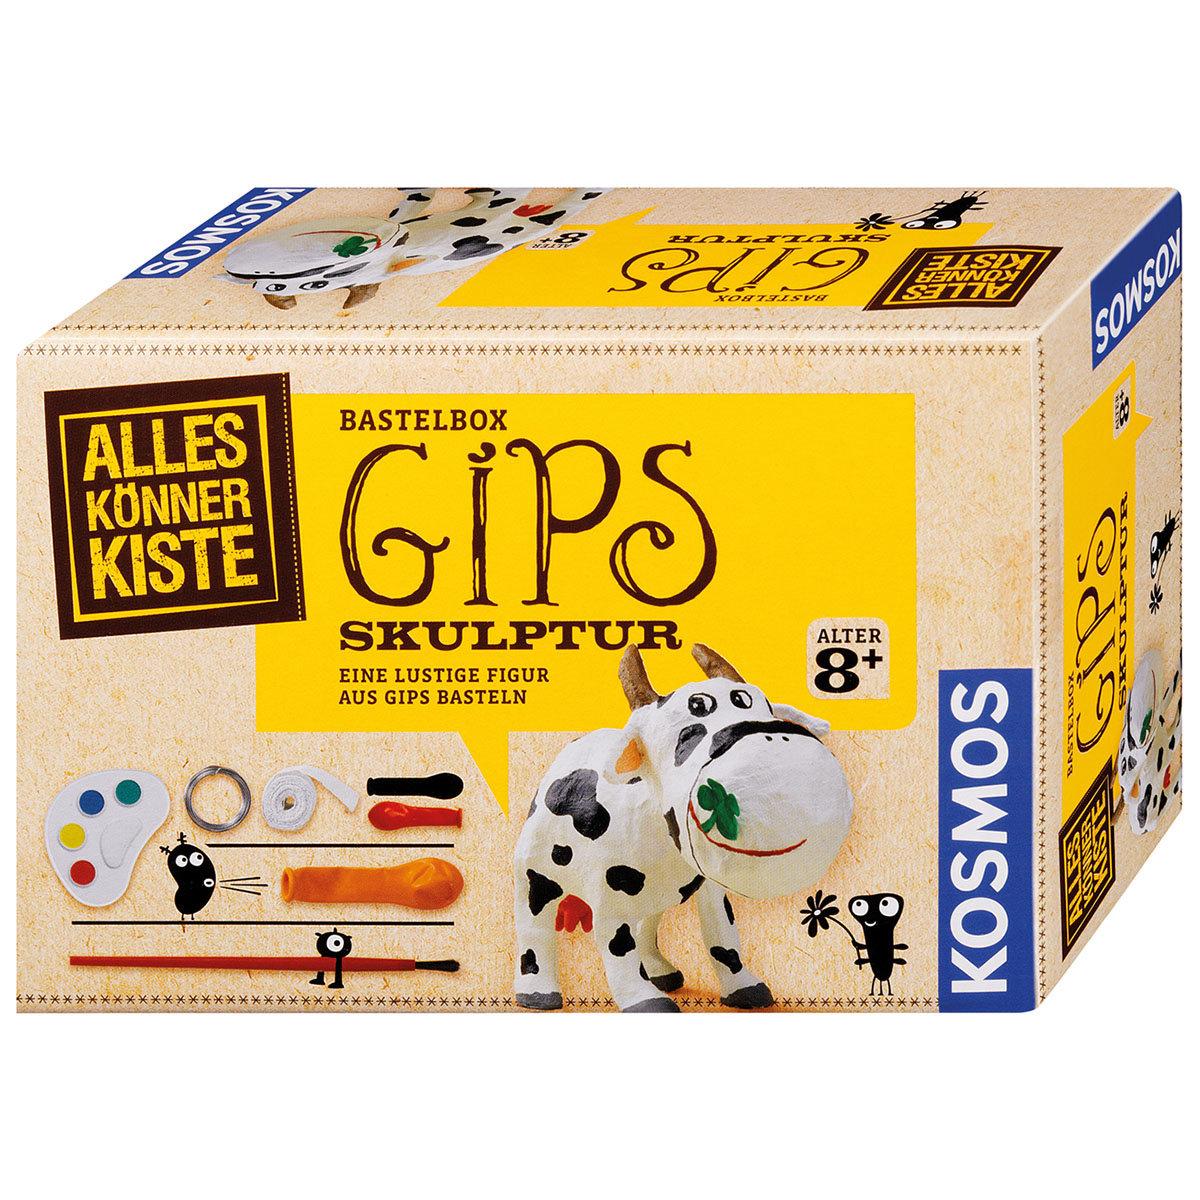 AllesKönnerKiste - Bastelbox Gips Skulpturen